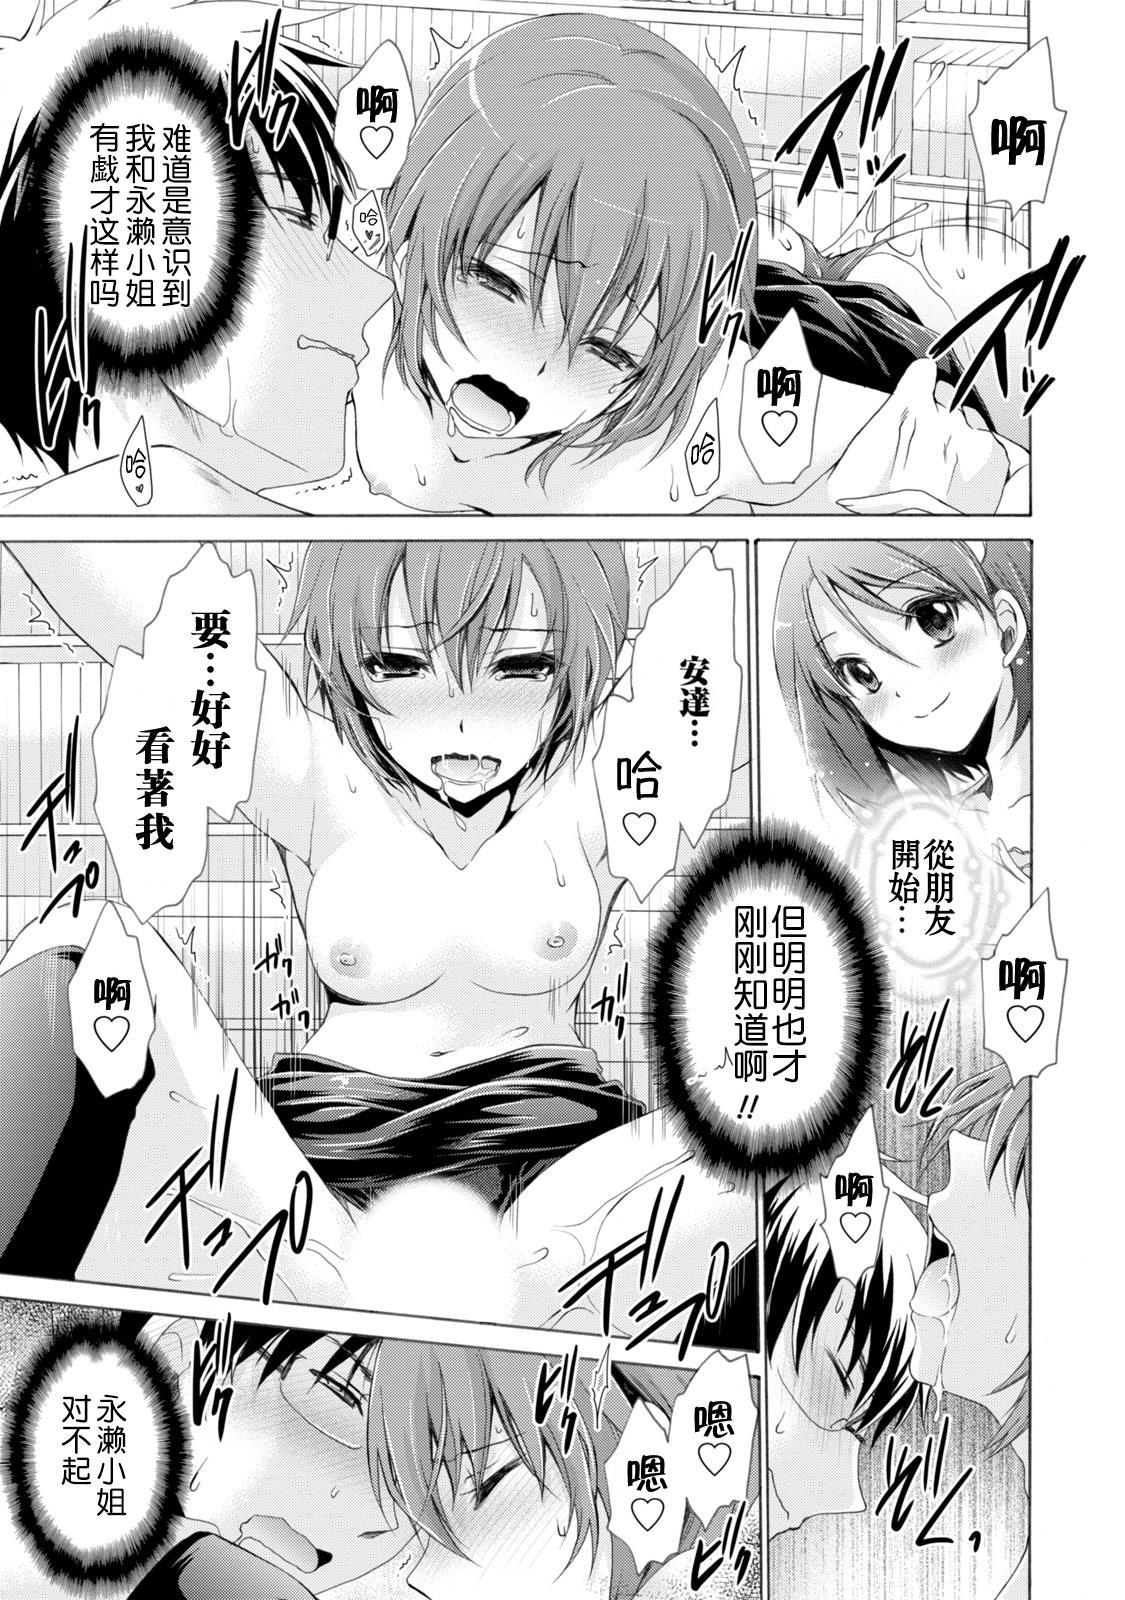 [Shinonome Ryu] Ore to Kanojo to Owaru Sekai - World's end LoveStory ch.1-9 [Chinese] [爱弹幕汉化组] [Digital] 42